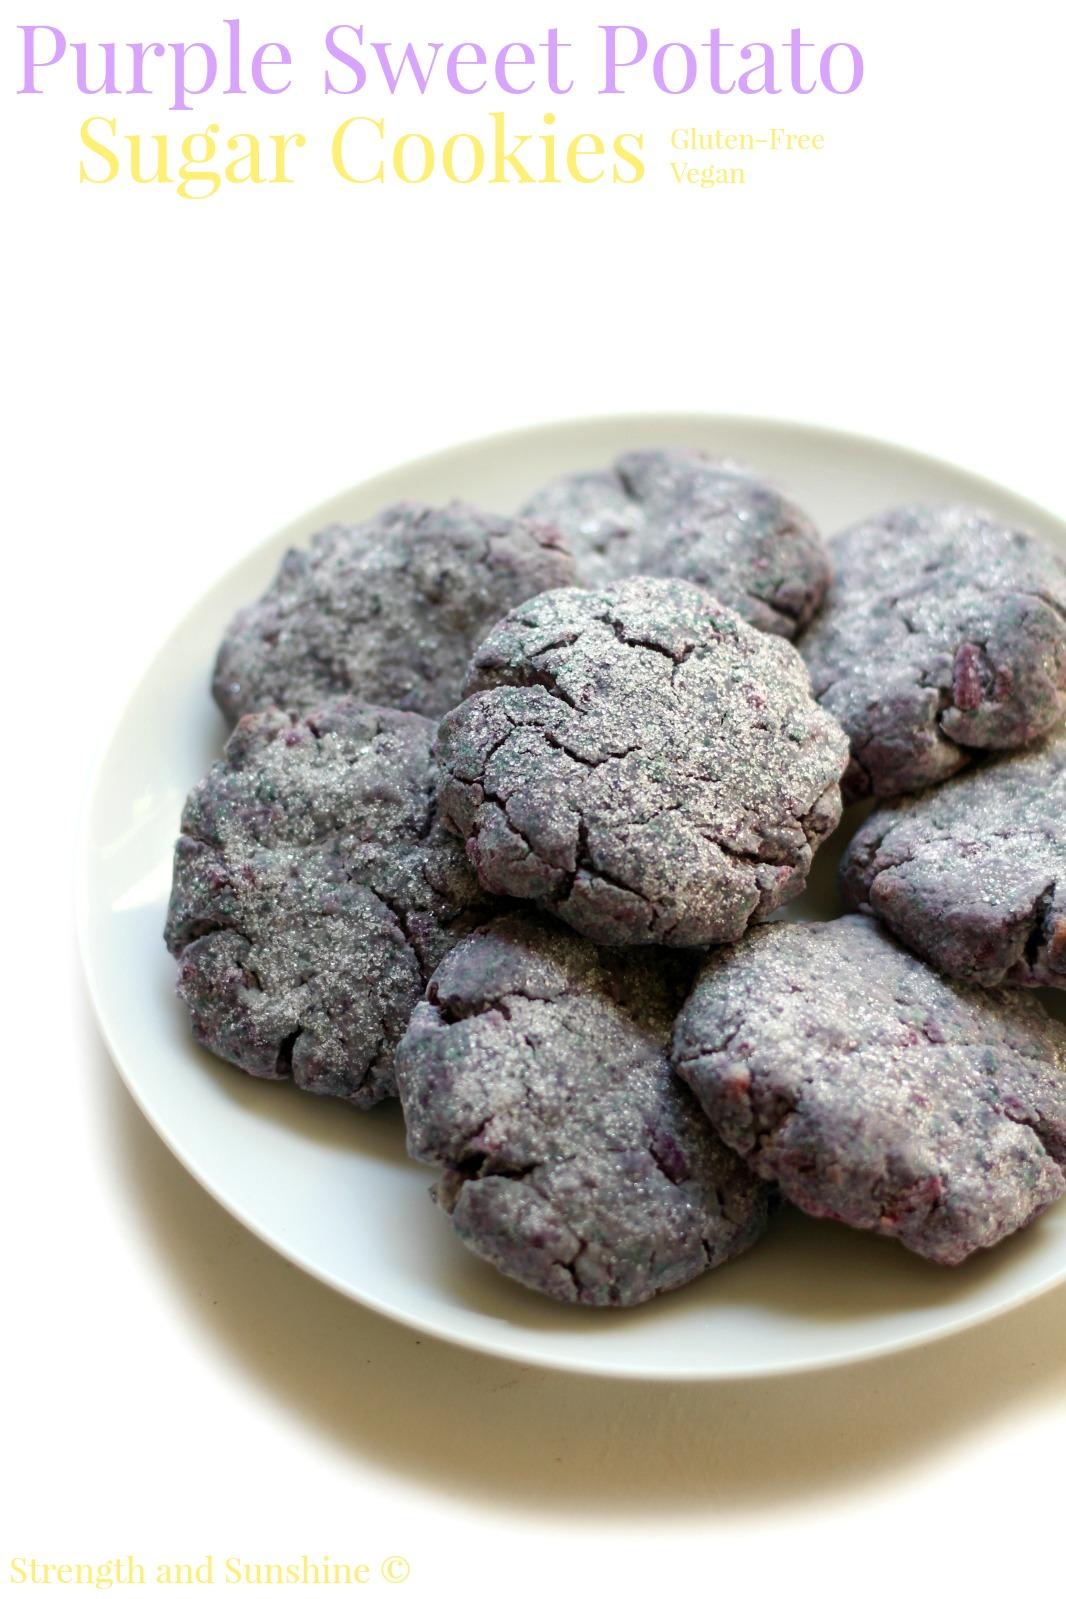 Purple-Sweet-Potato-Sugar-Cookies-PM1